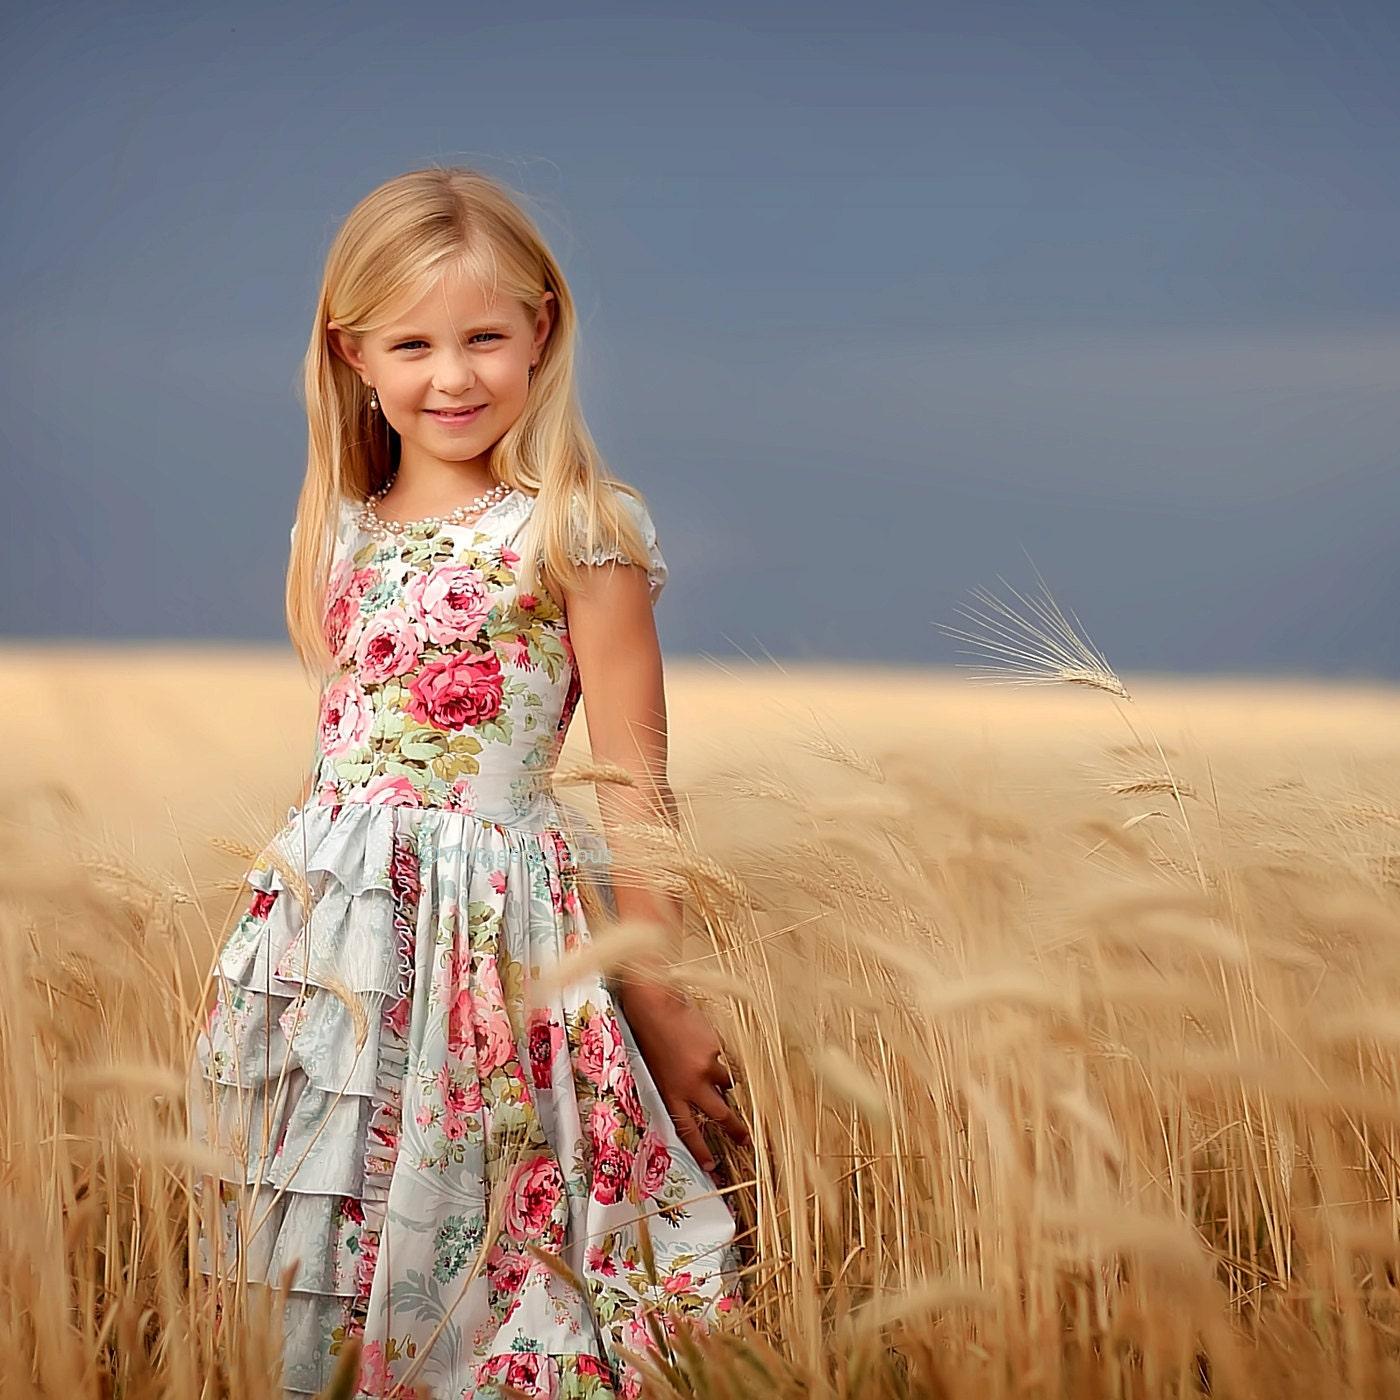 Flower Girls Dress, Easter, Layaway Plan A  60 day 3 payments. Formal Little Girls Dress In Ruffles, 18 months, 2t - 4t, 5 - 8